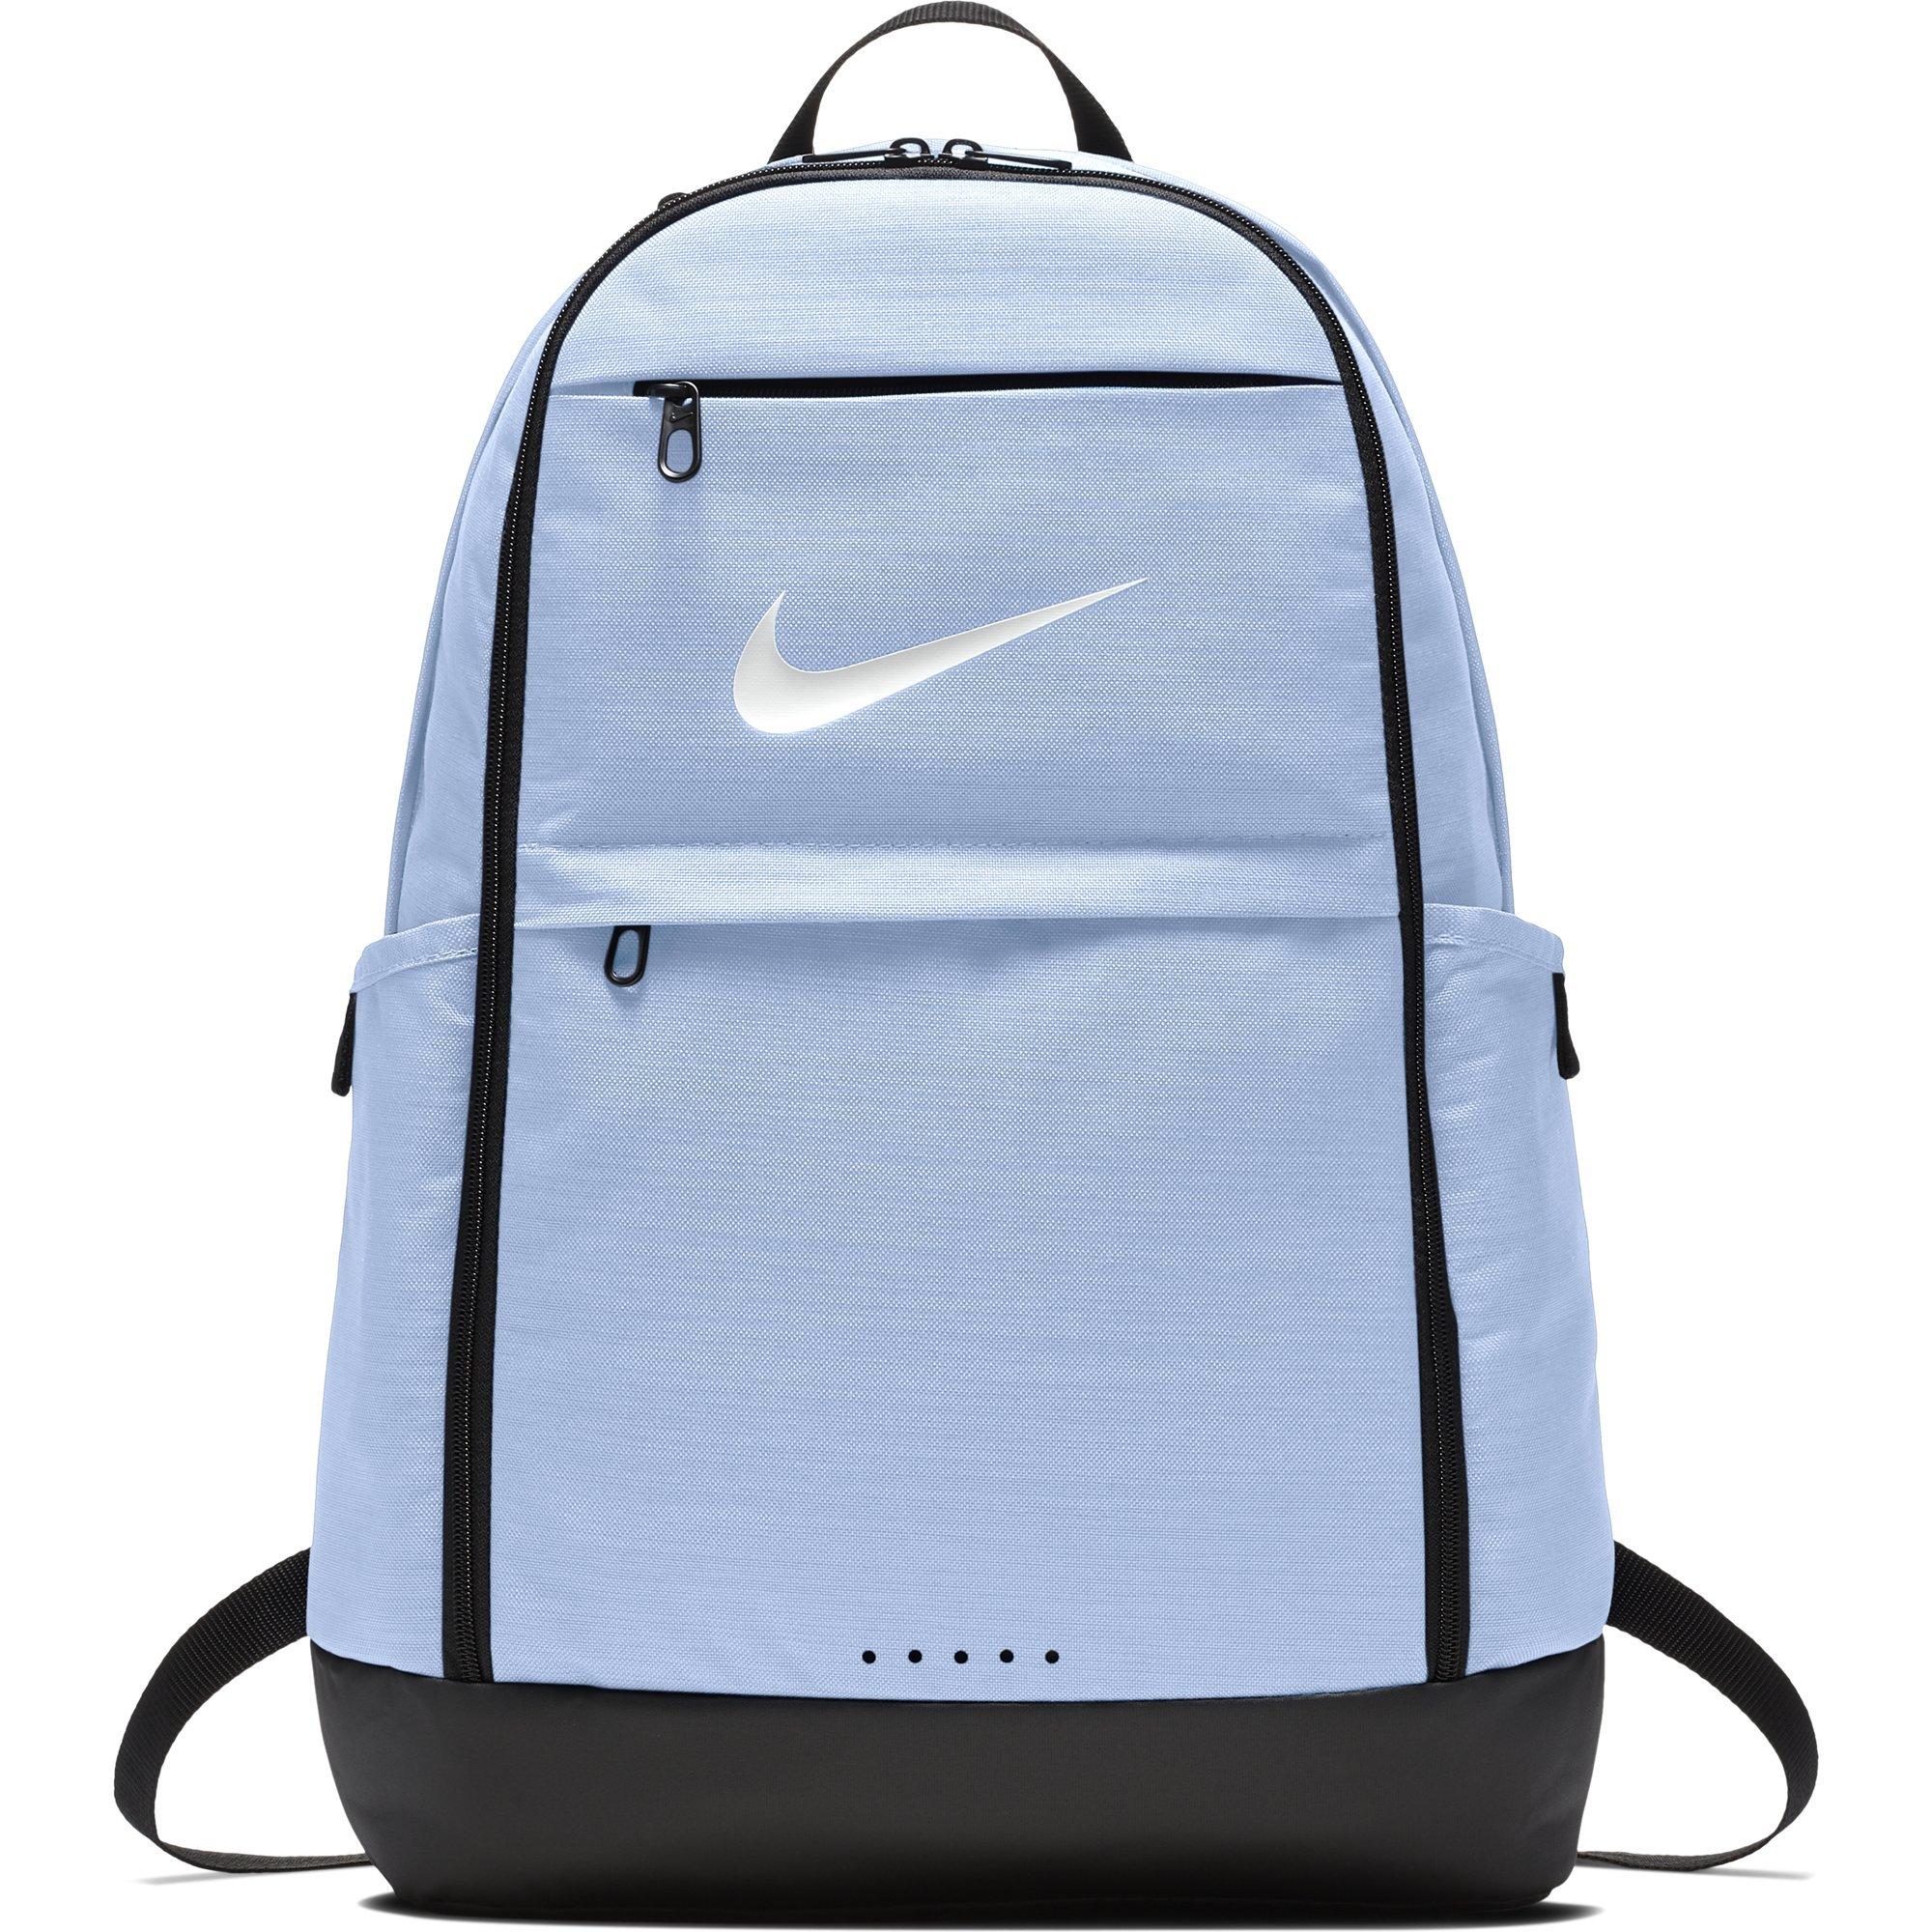 NIKE Brasilia Backpack, Royal Tint/Black/White, X-Large